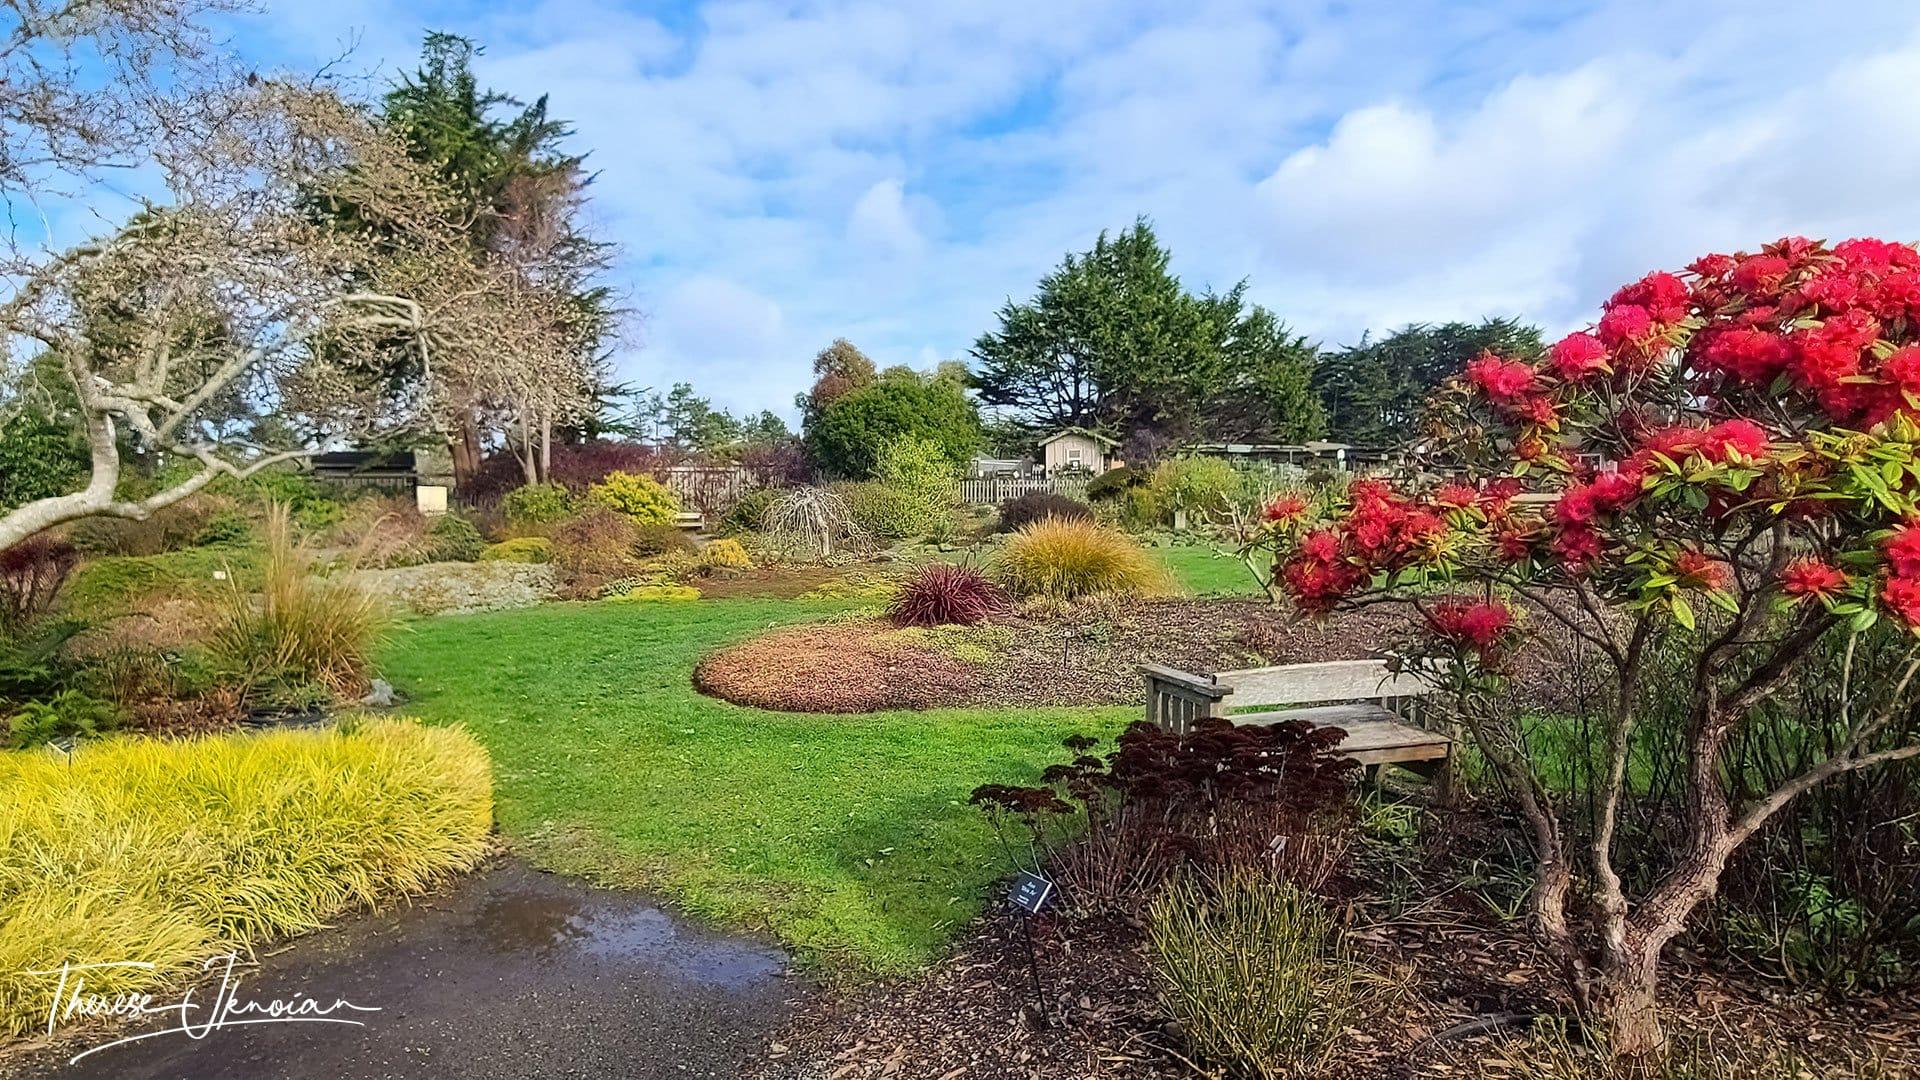 Mendocino Botanic Garden Groomed Lawn